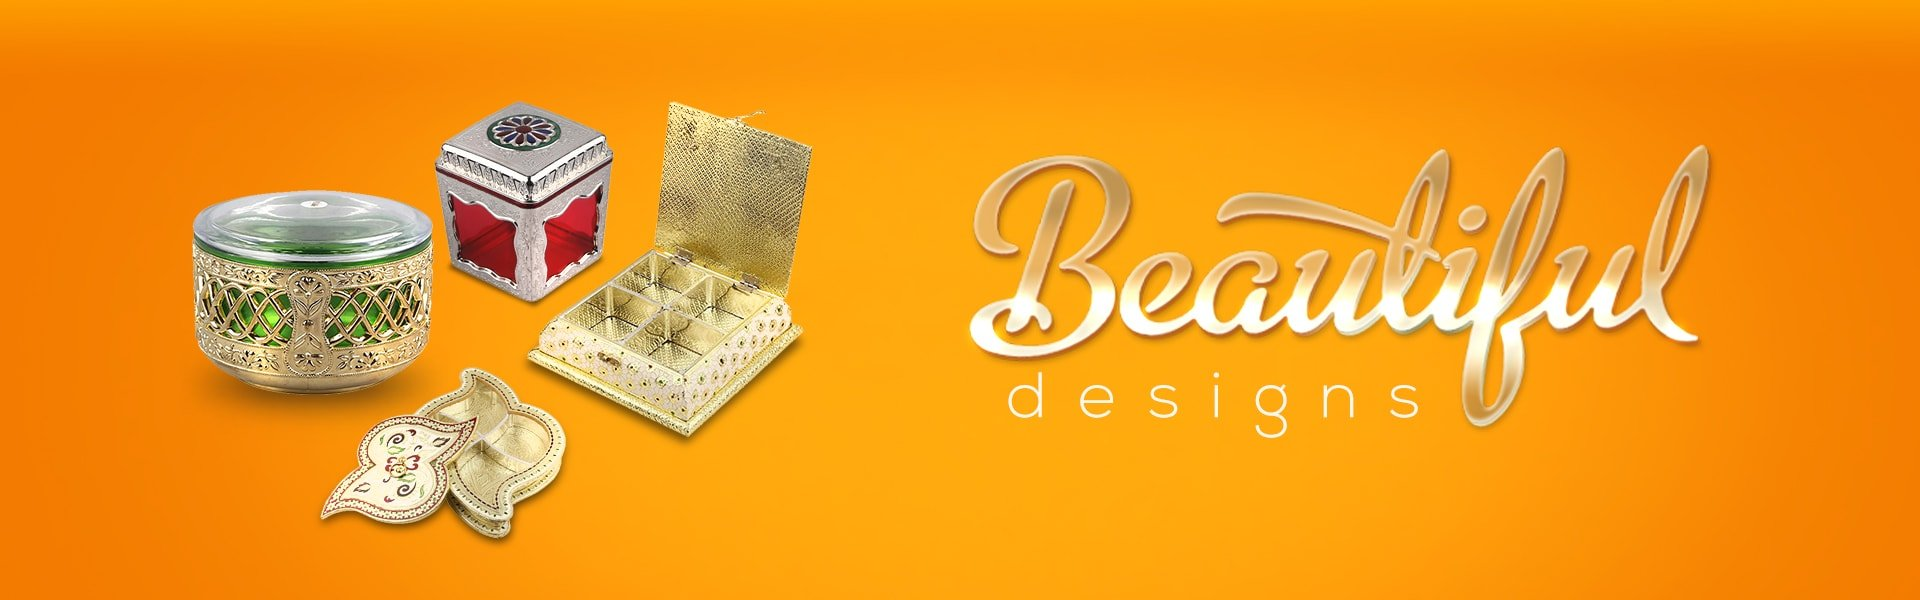 Pennysaver Wedding Return Gifts Buy Indian Return Gifts Online